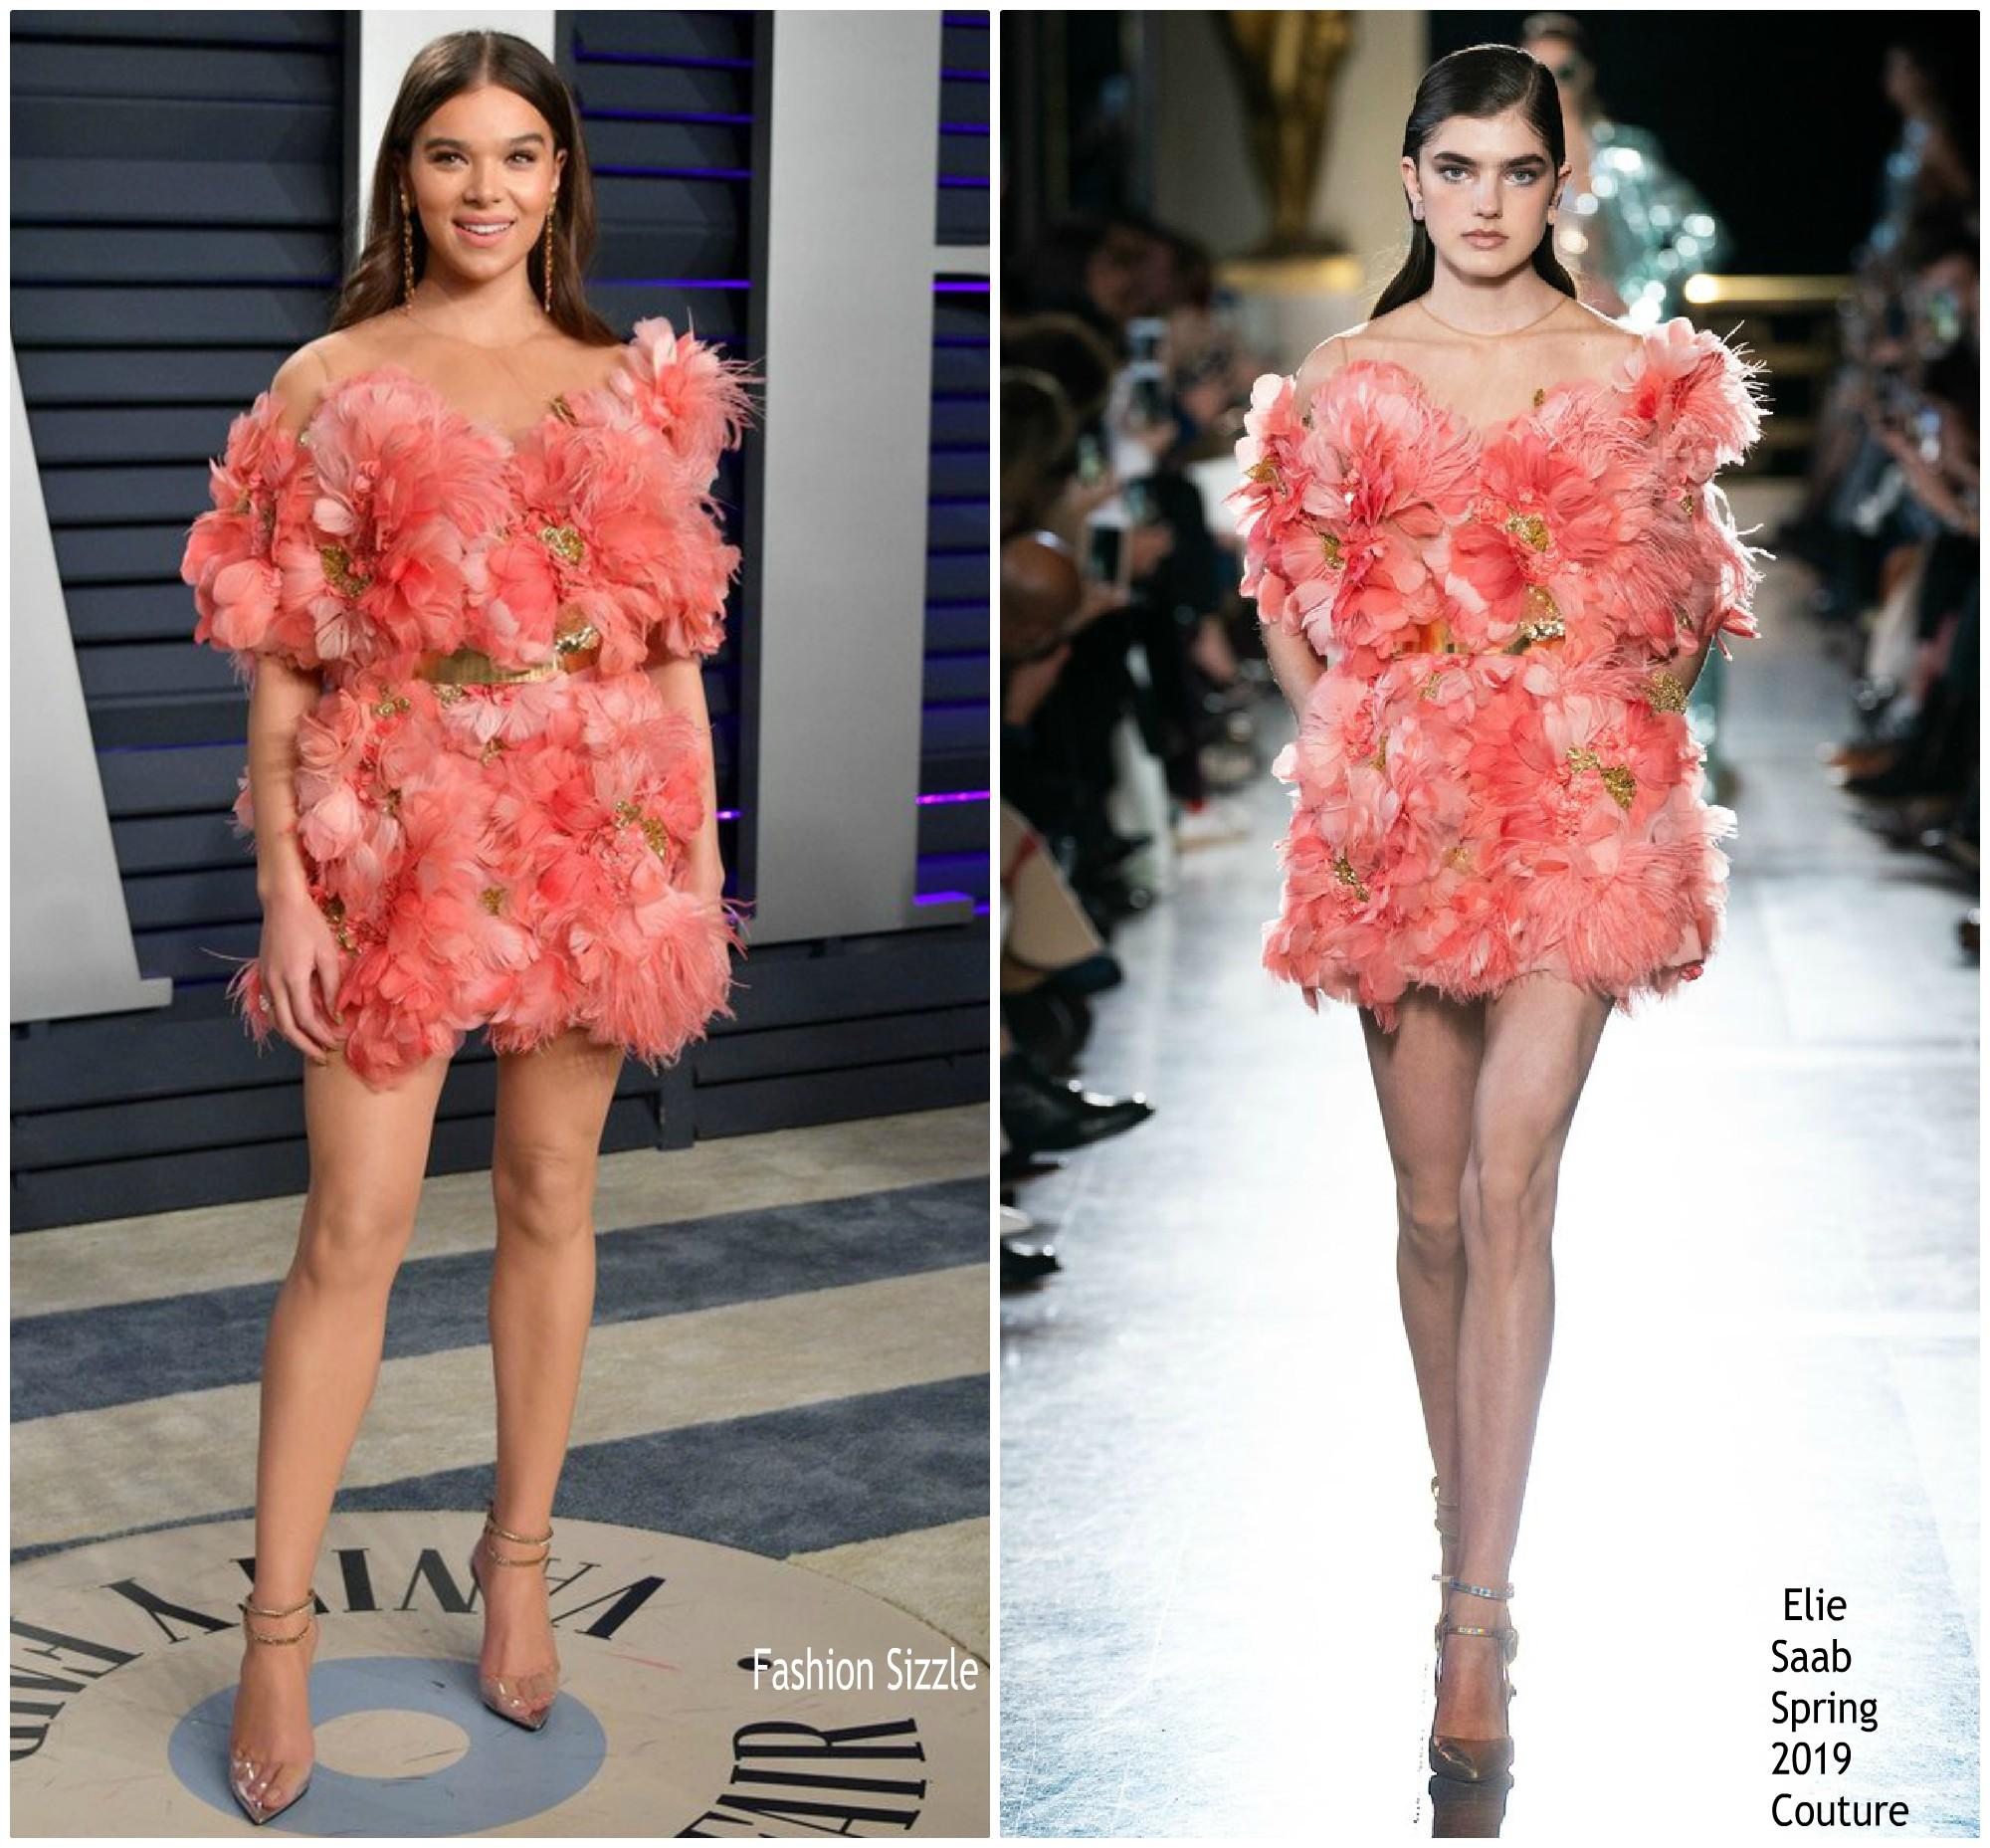 hailee-steinfeld-in-elie-saab-haute -couture-2019-vanity-fair-oscar-party